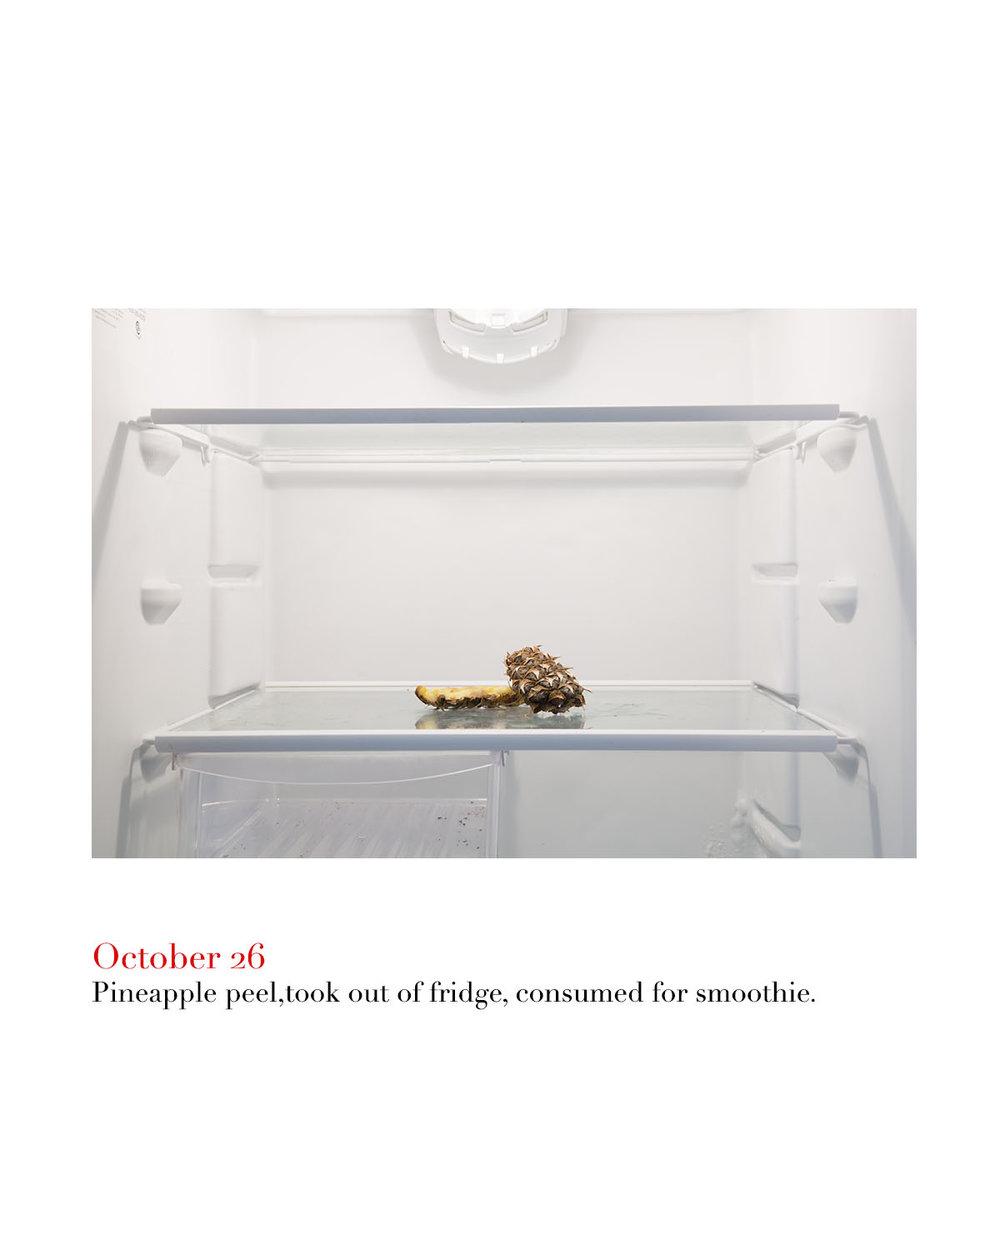 Oct 26 pineapple copy.jpg